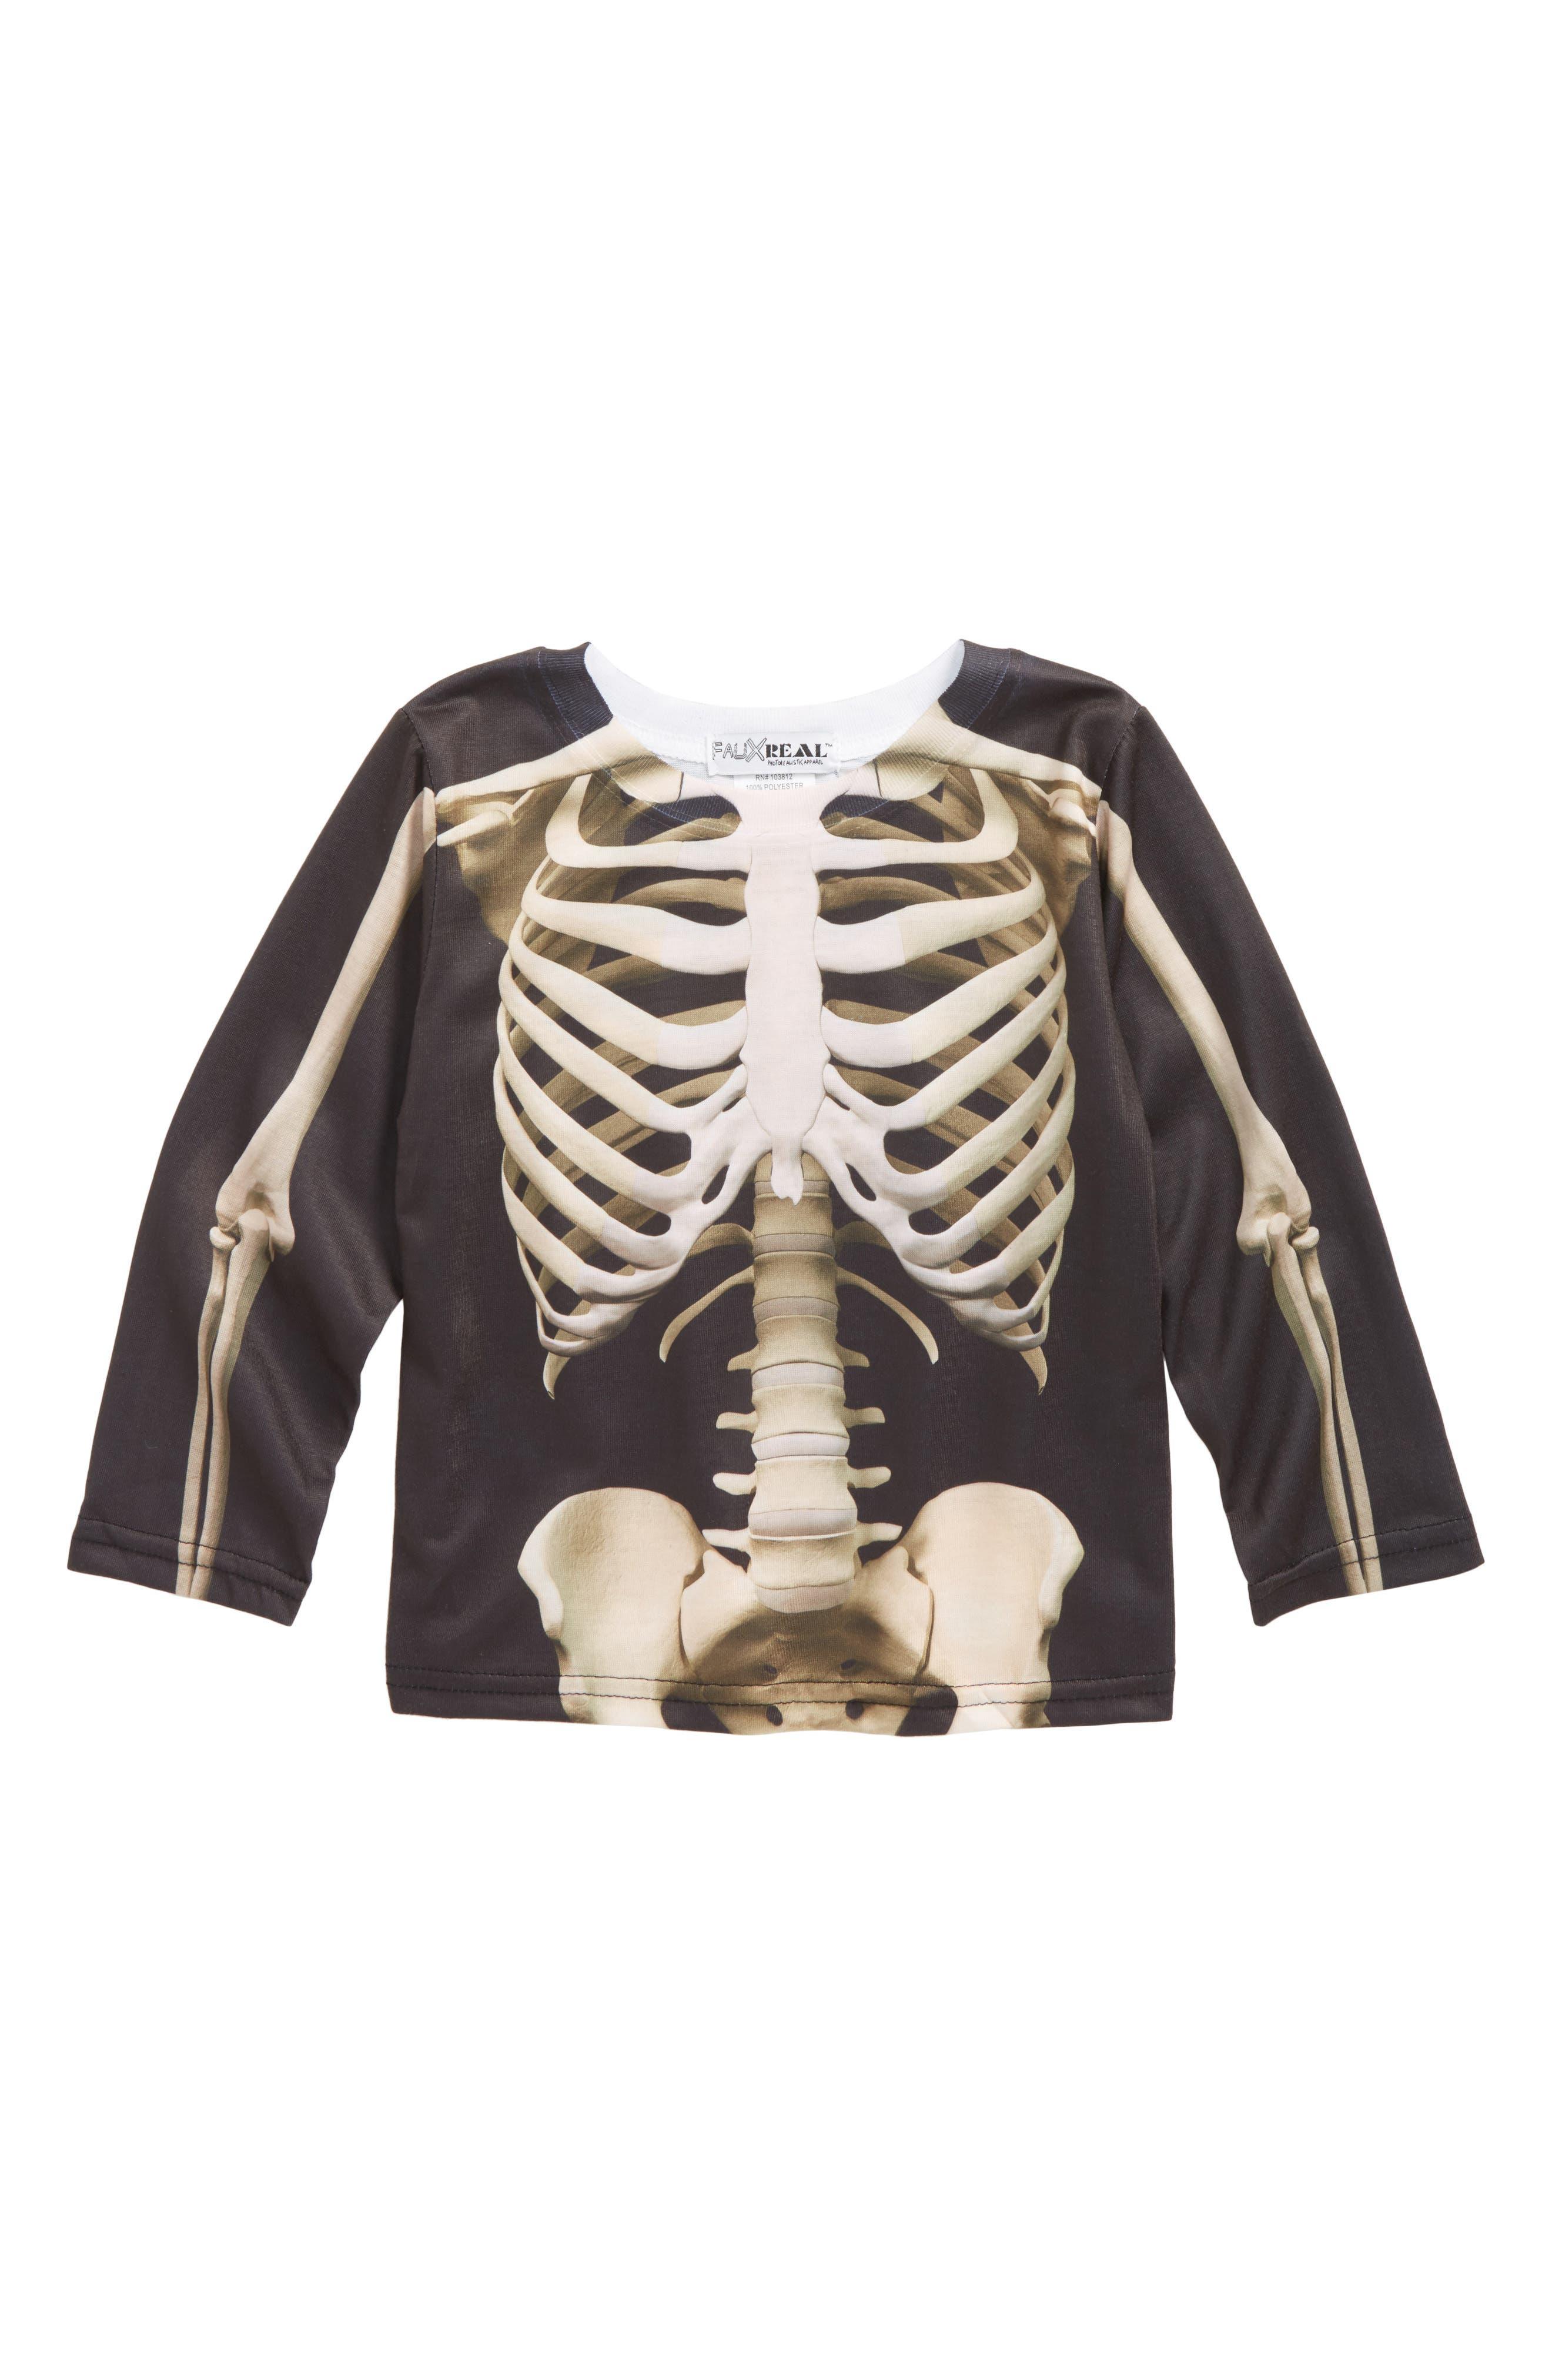 Main Image - Faux Real Skeleton Screenprint T-Shirt (Toddler Boys)